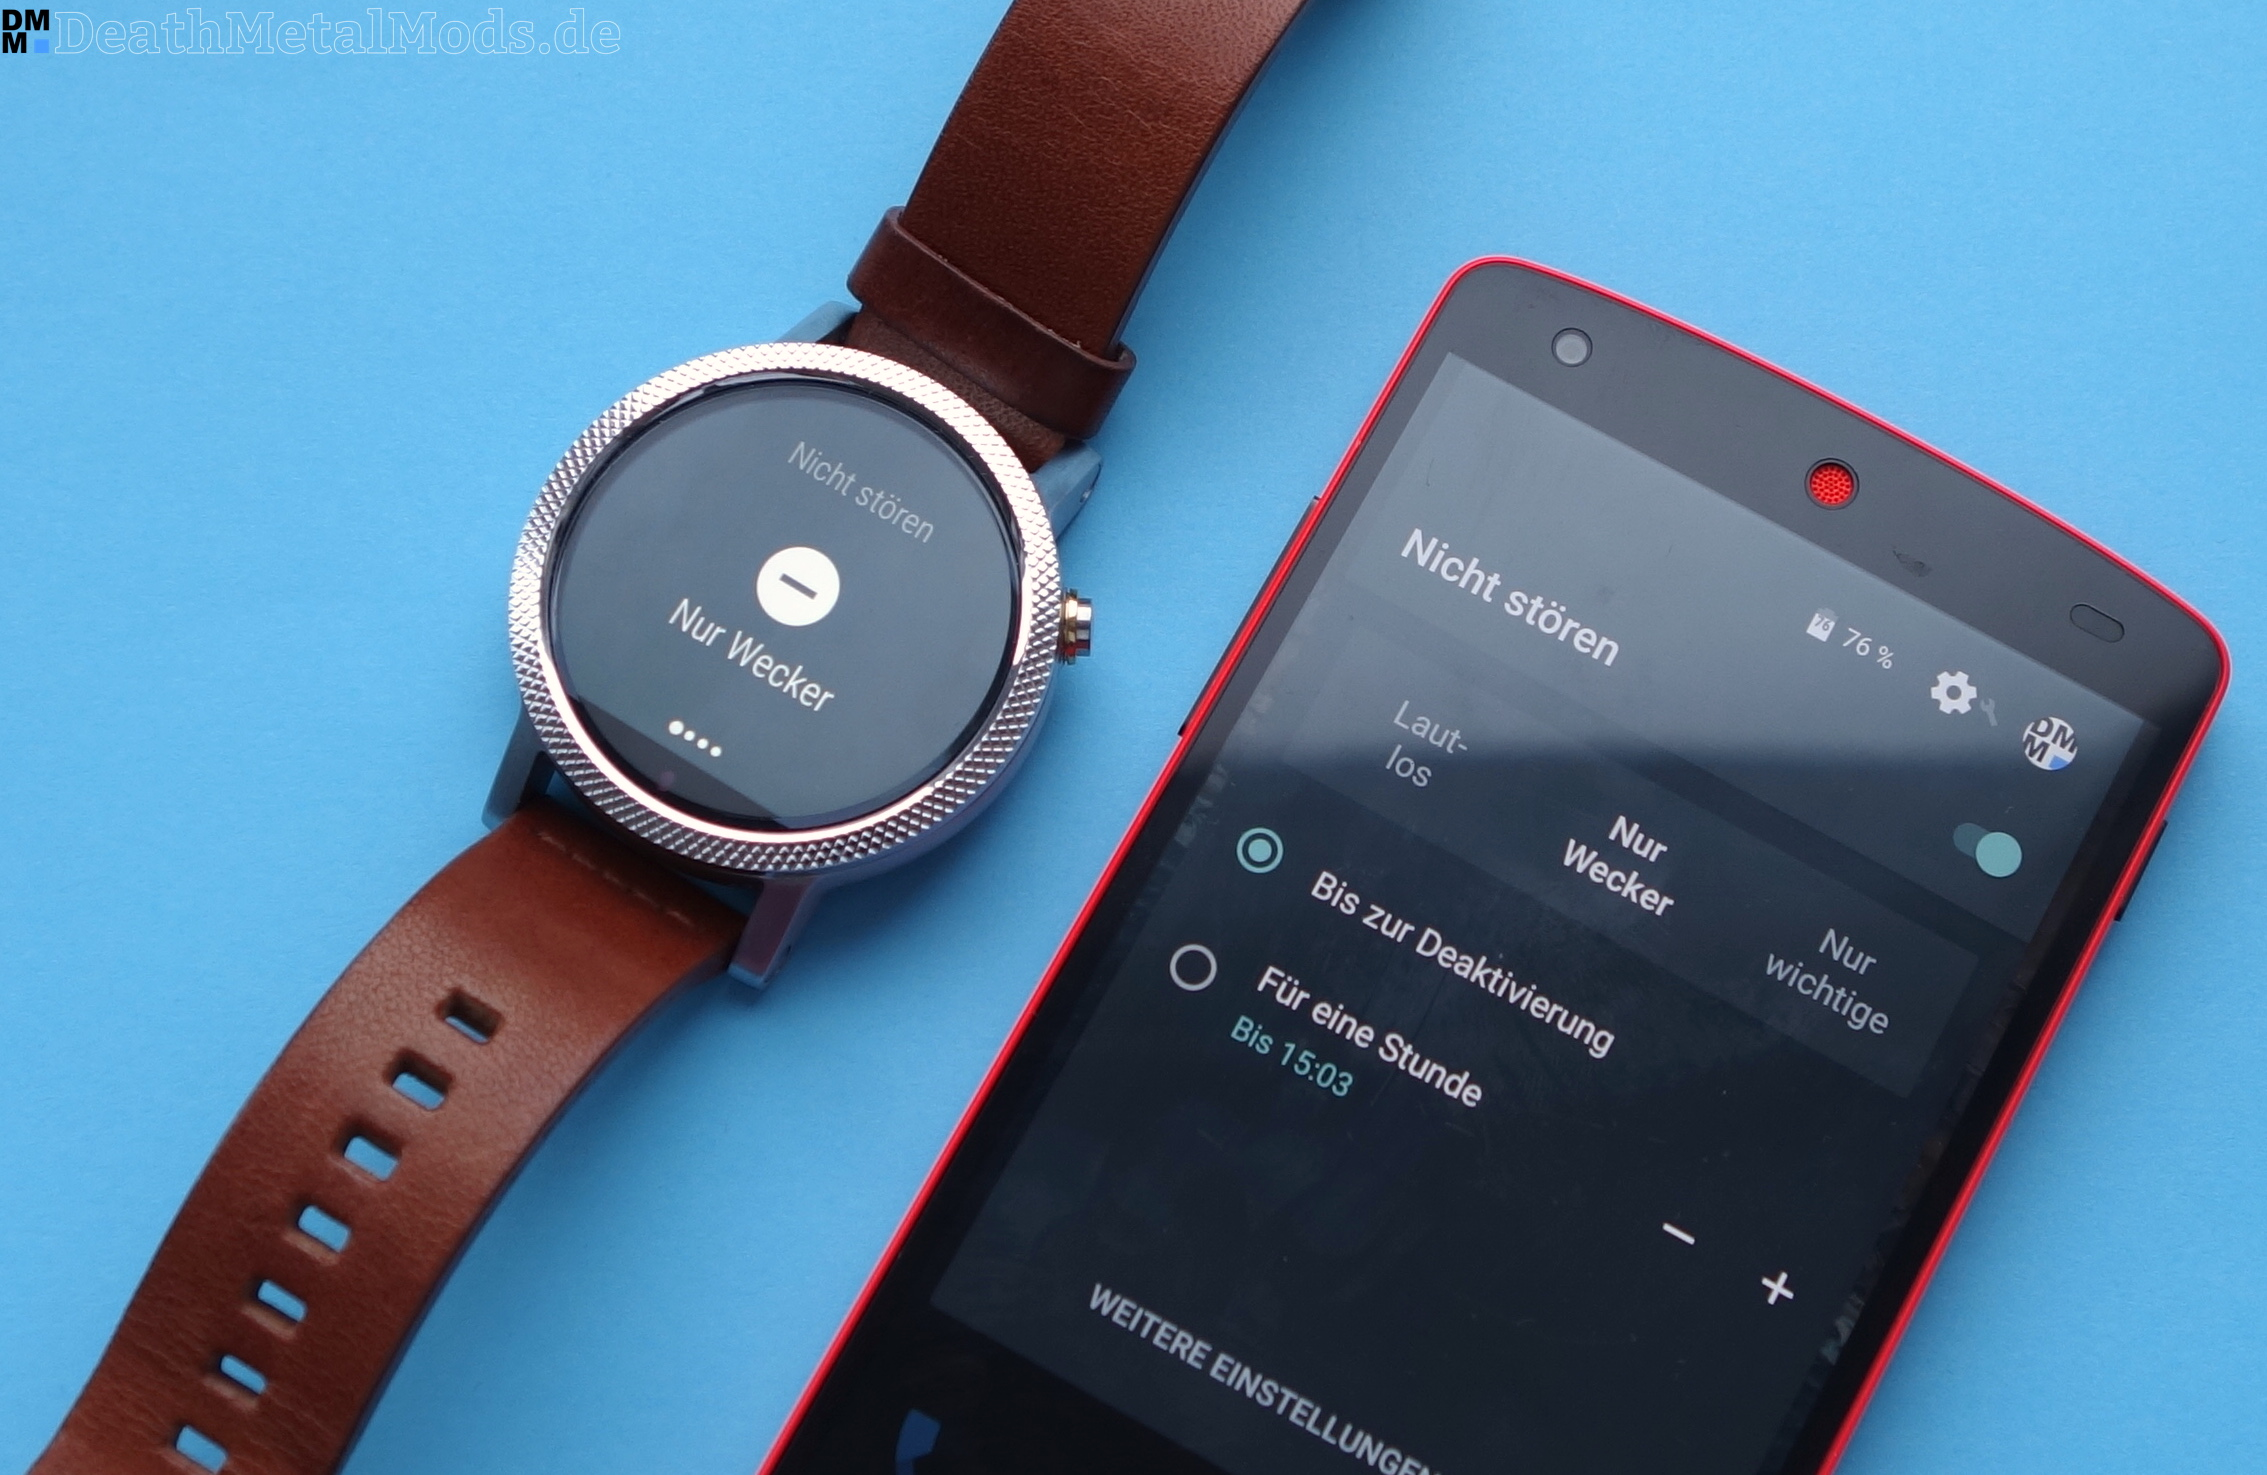 AndroidWear6NichtStoeren